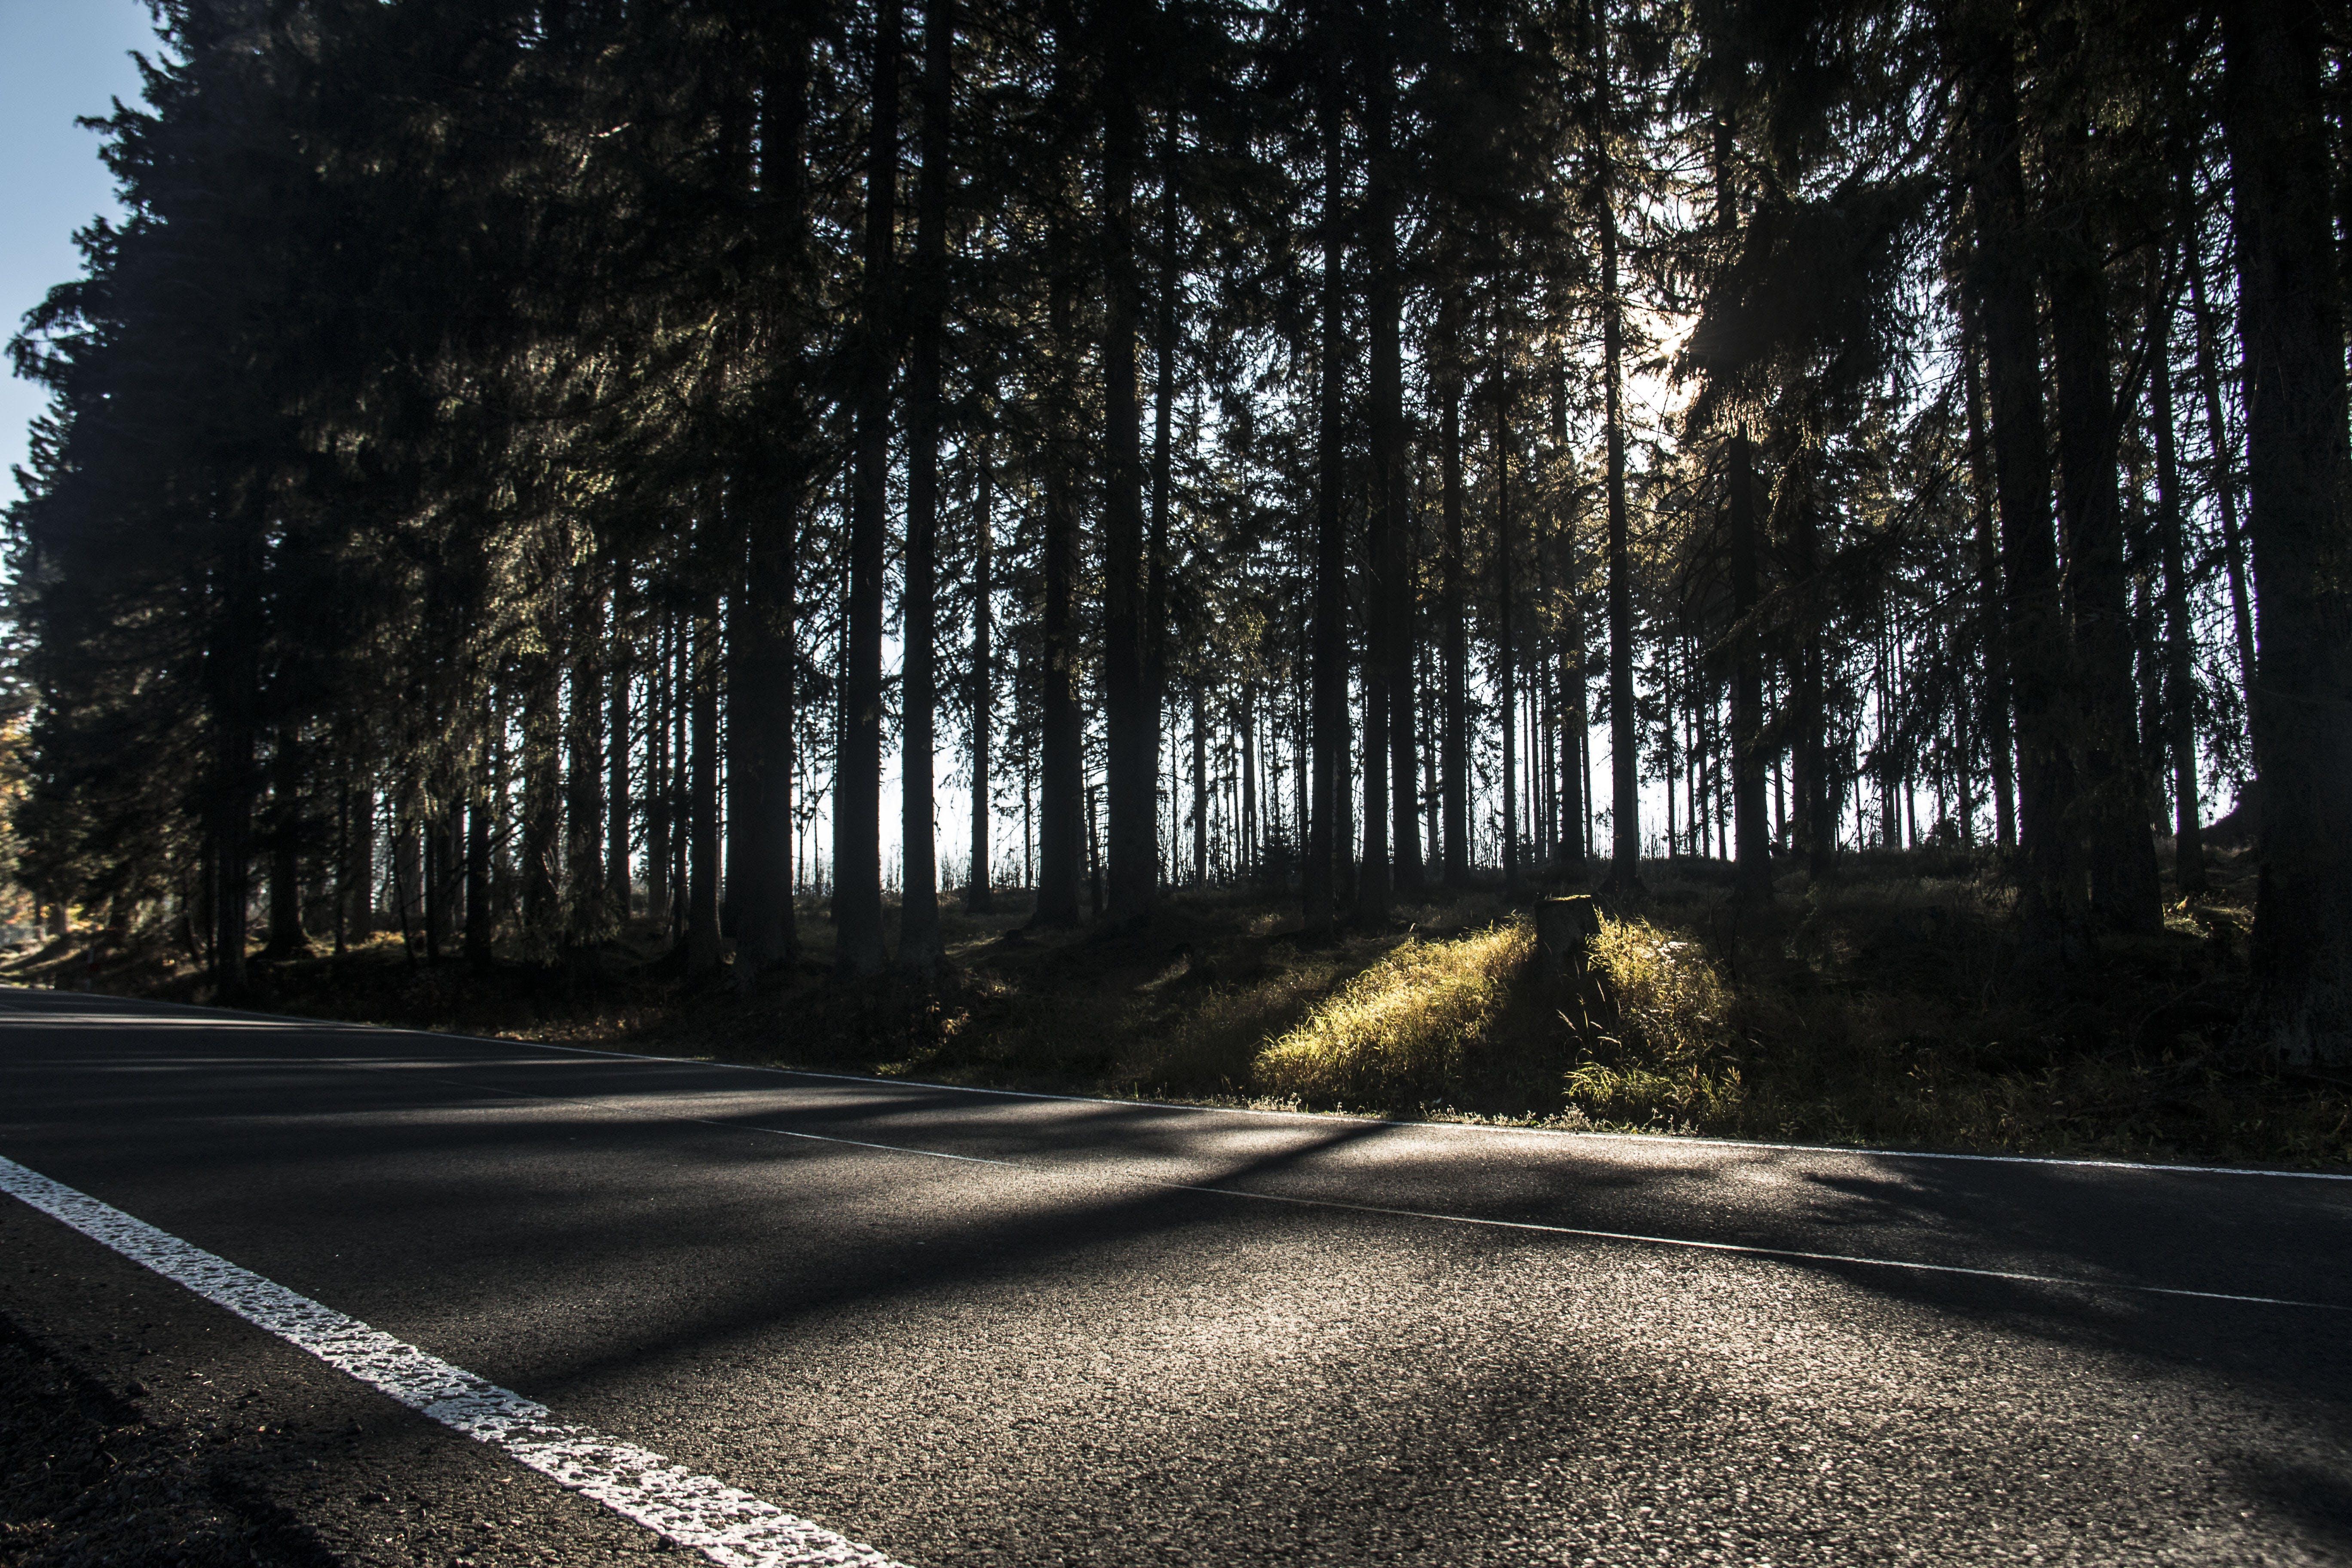 Free stock photo of road, way, asphalt, road trip